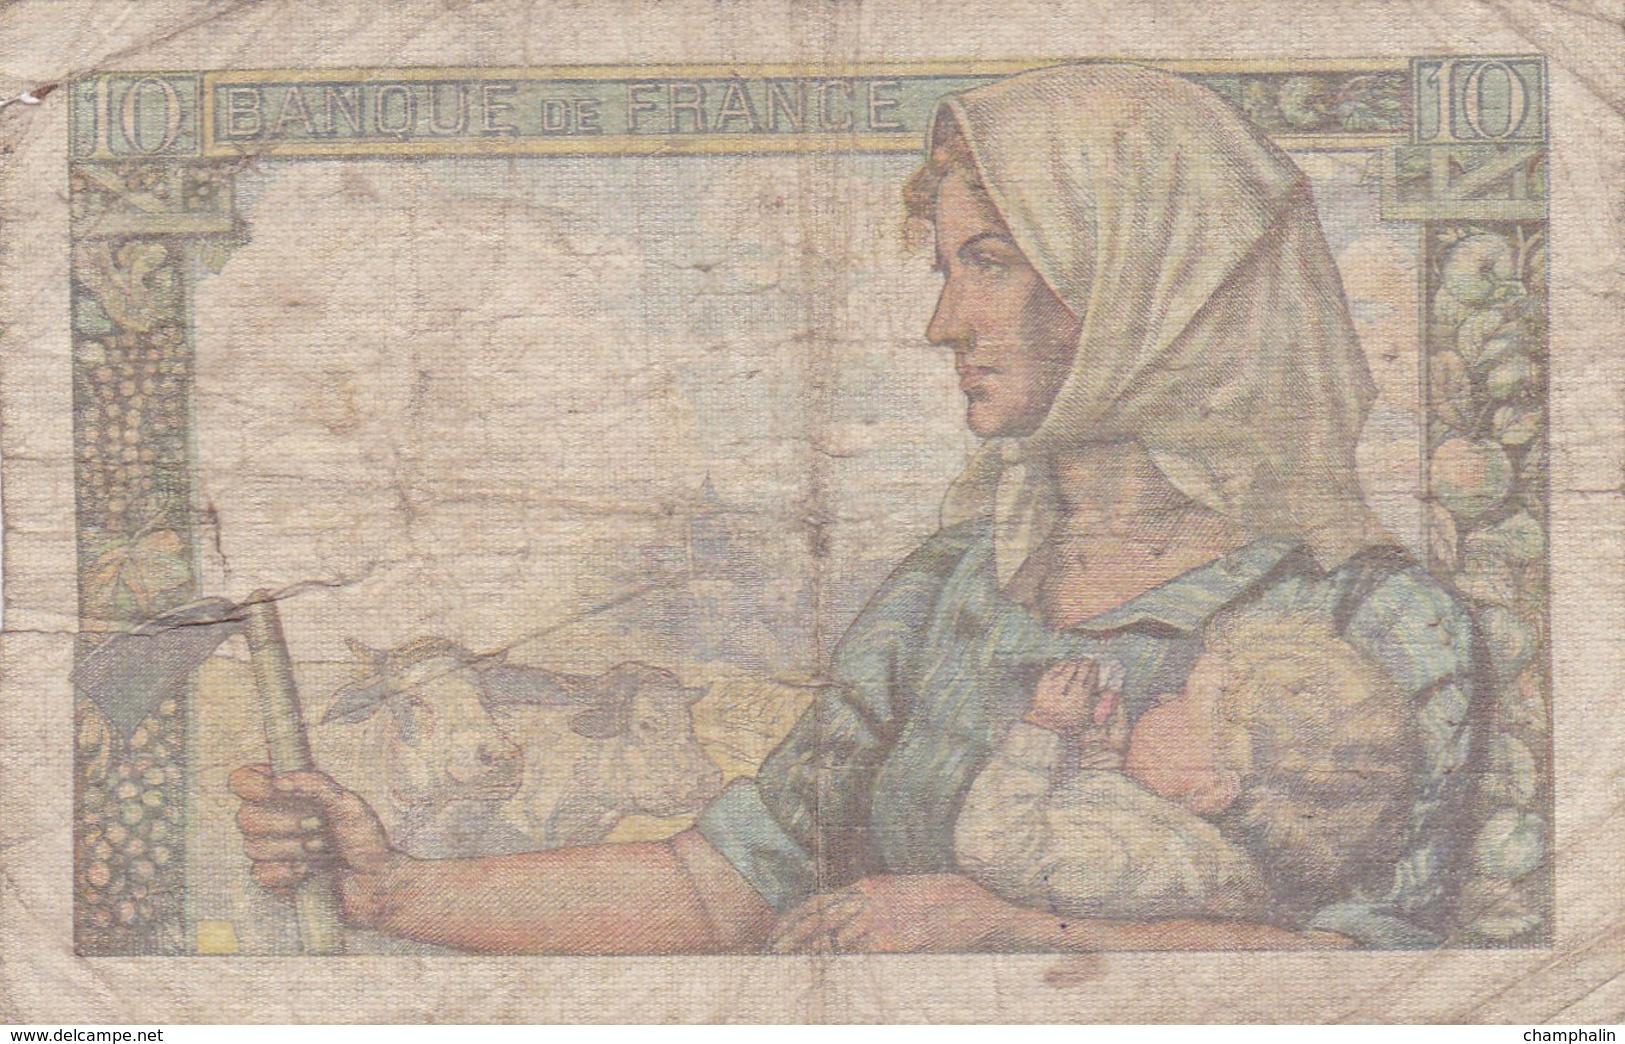 France - Billet De 10 Francs Type Mineur - 26 Novembre 1942 - 1871-1952 Antichi Franchi Circolanti Nel XX Secolo